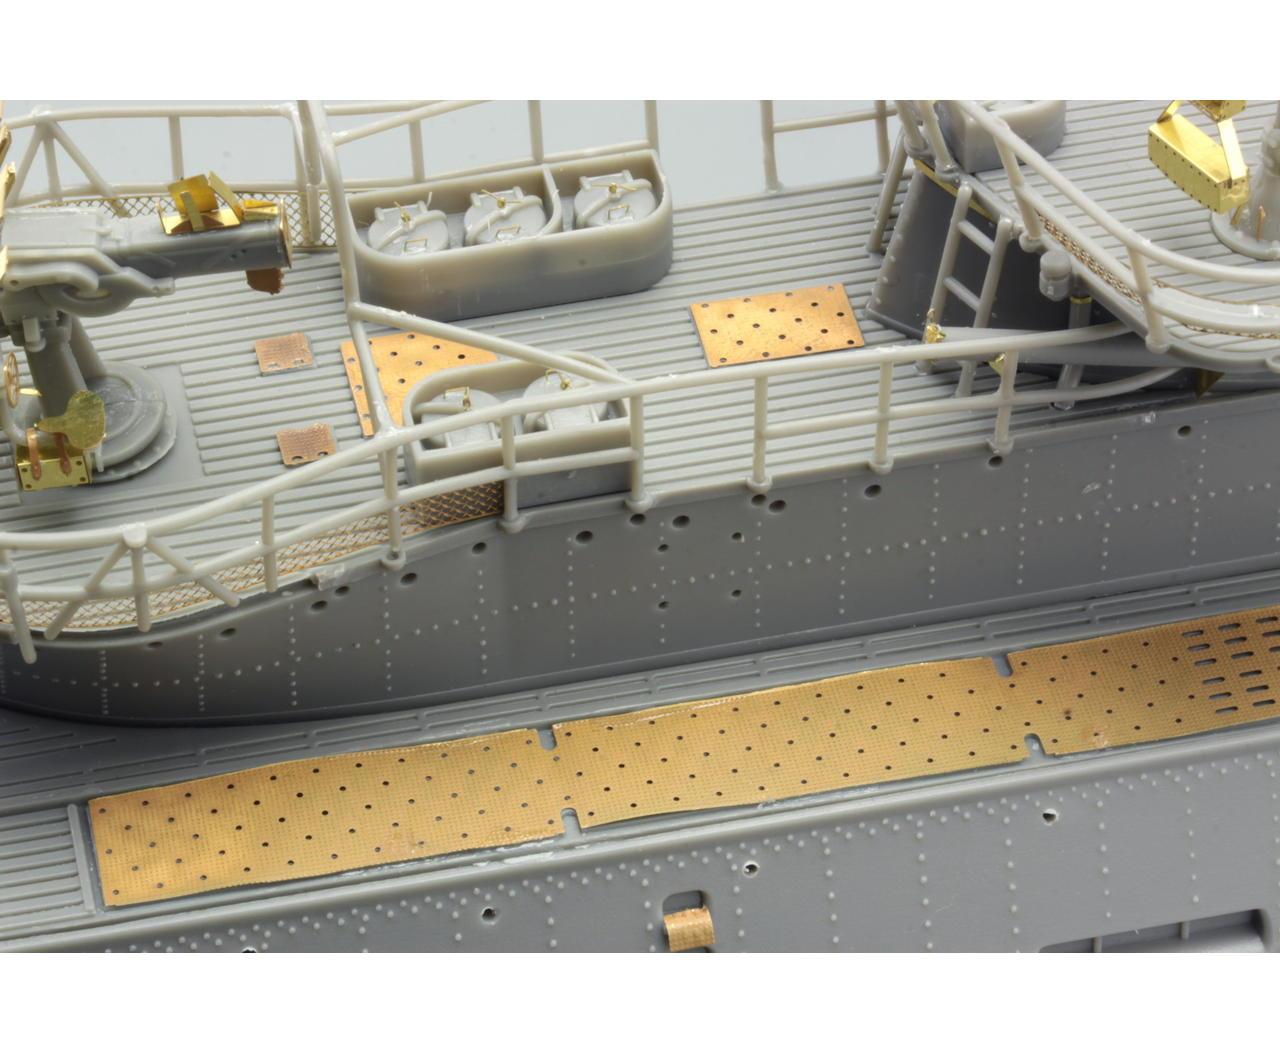 U-BOAT IXC 1/72 - Eduard Store